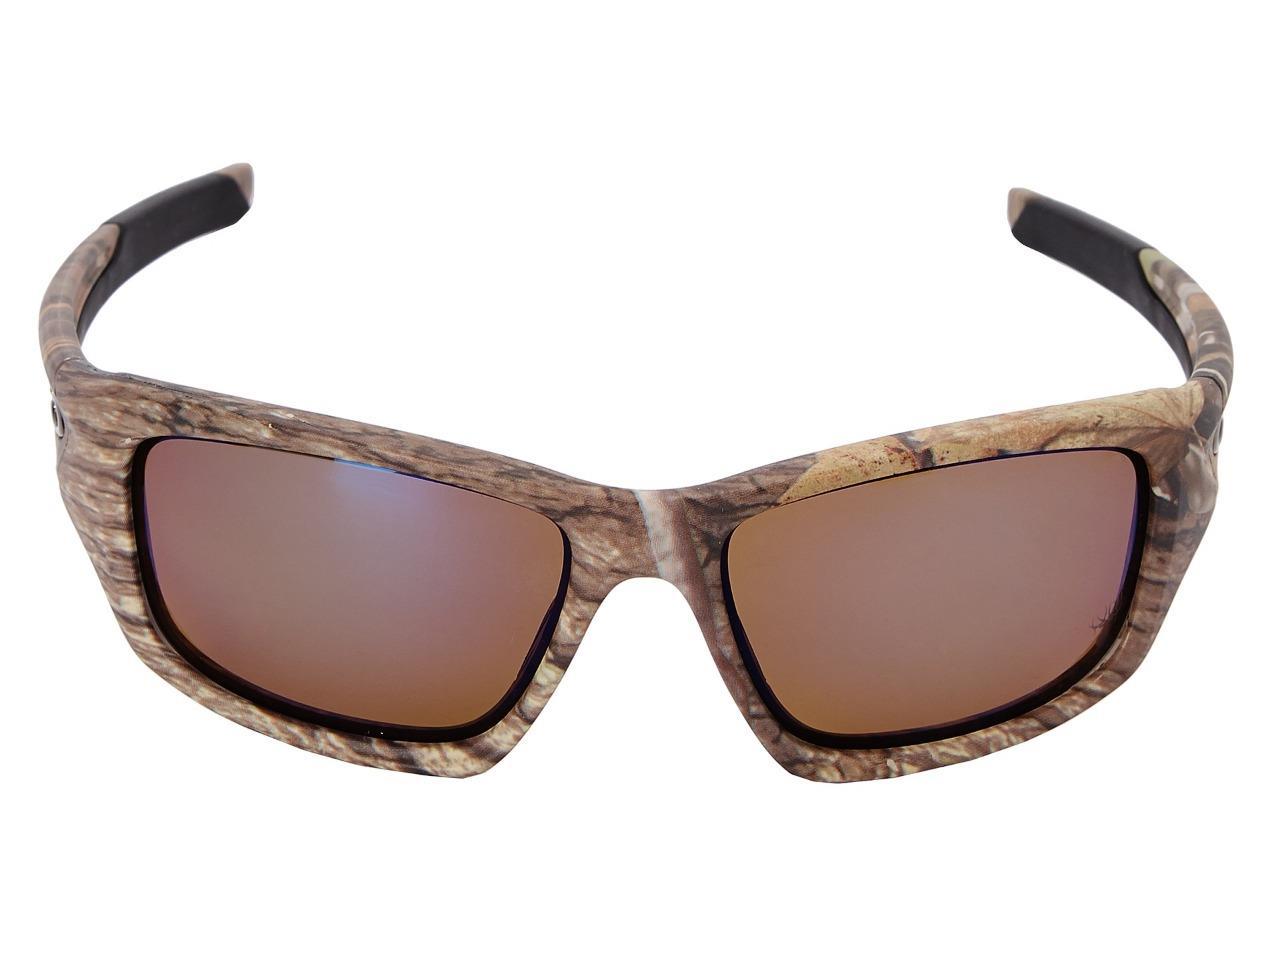 New 2016 oakley valve sunglasses kings camo polarized for Oakley polarized fishing sunglasses